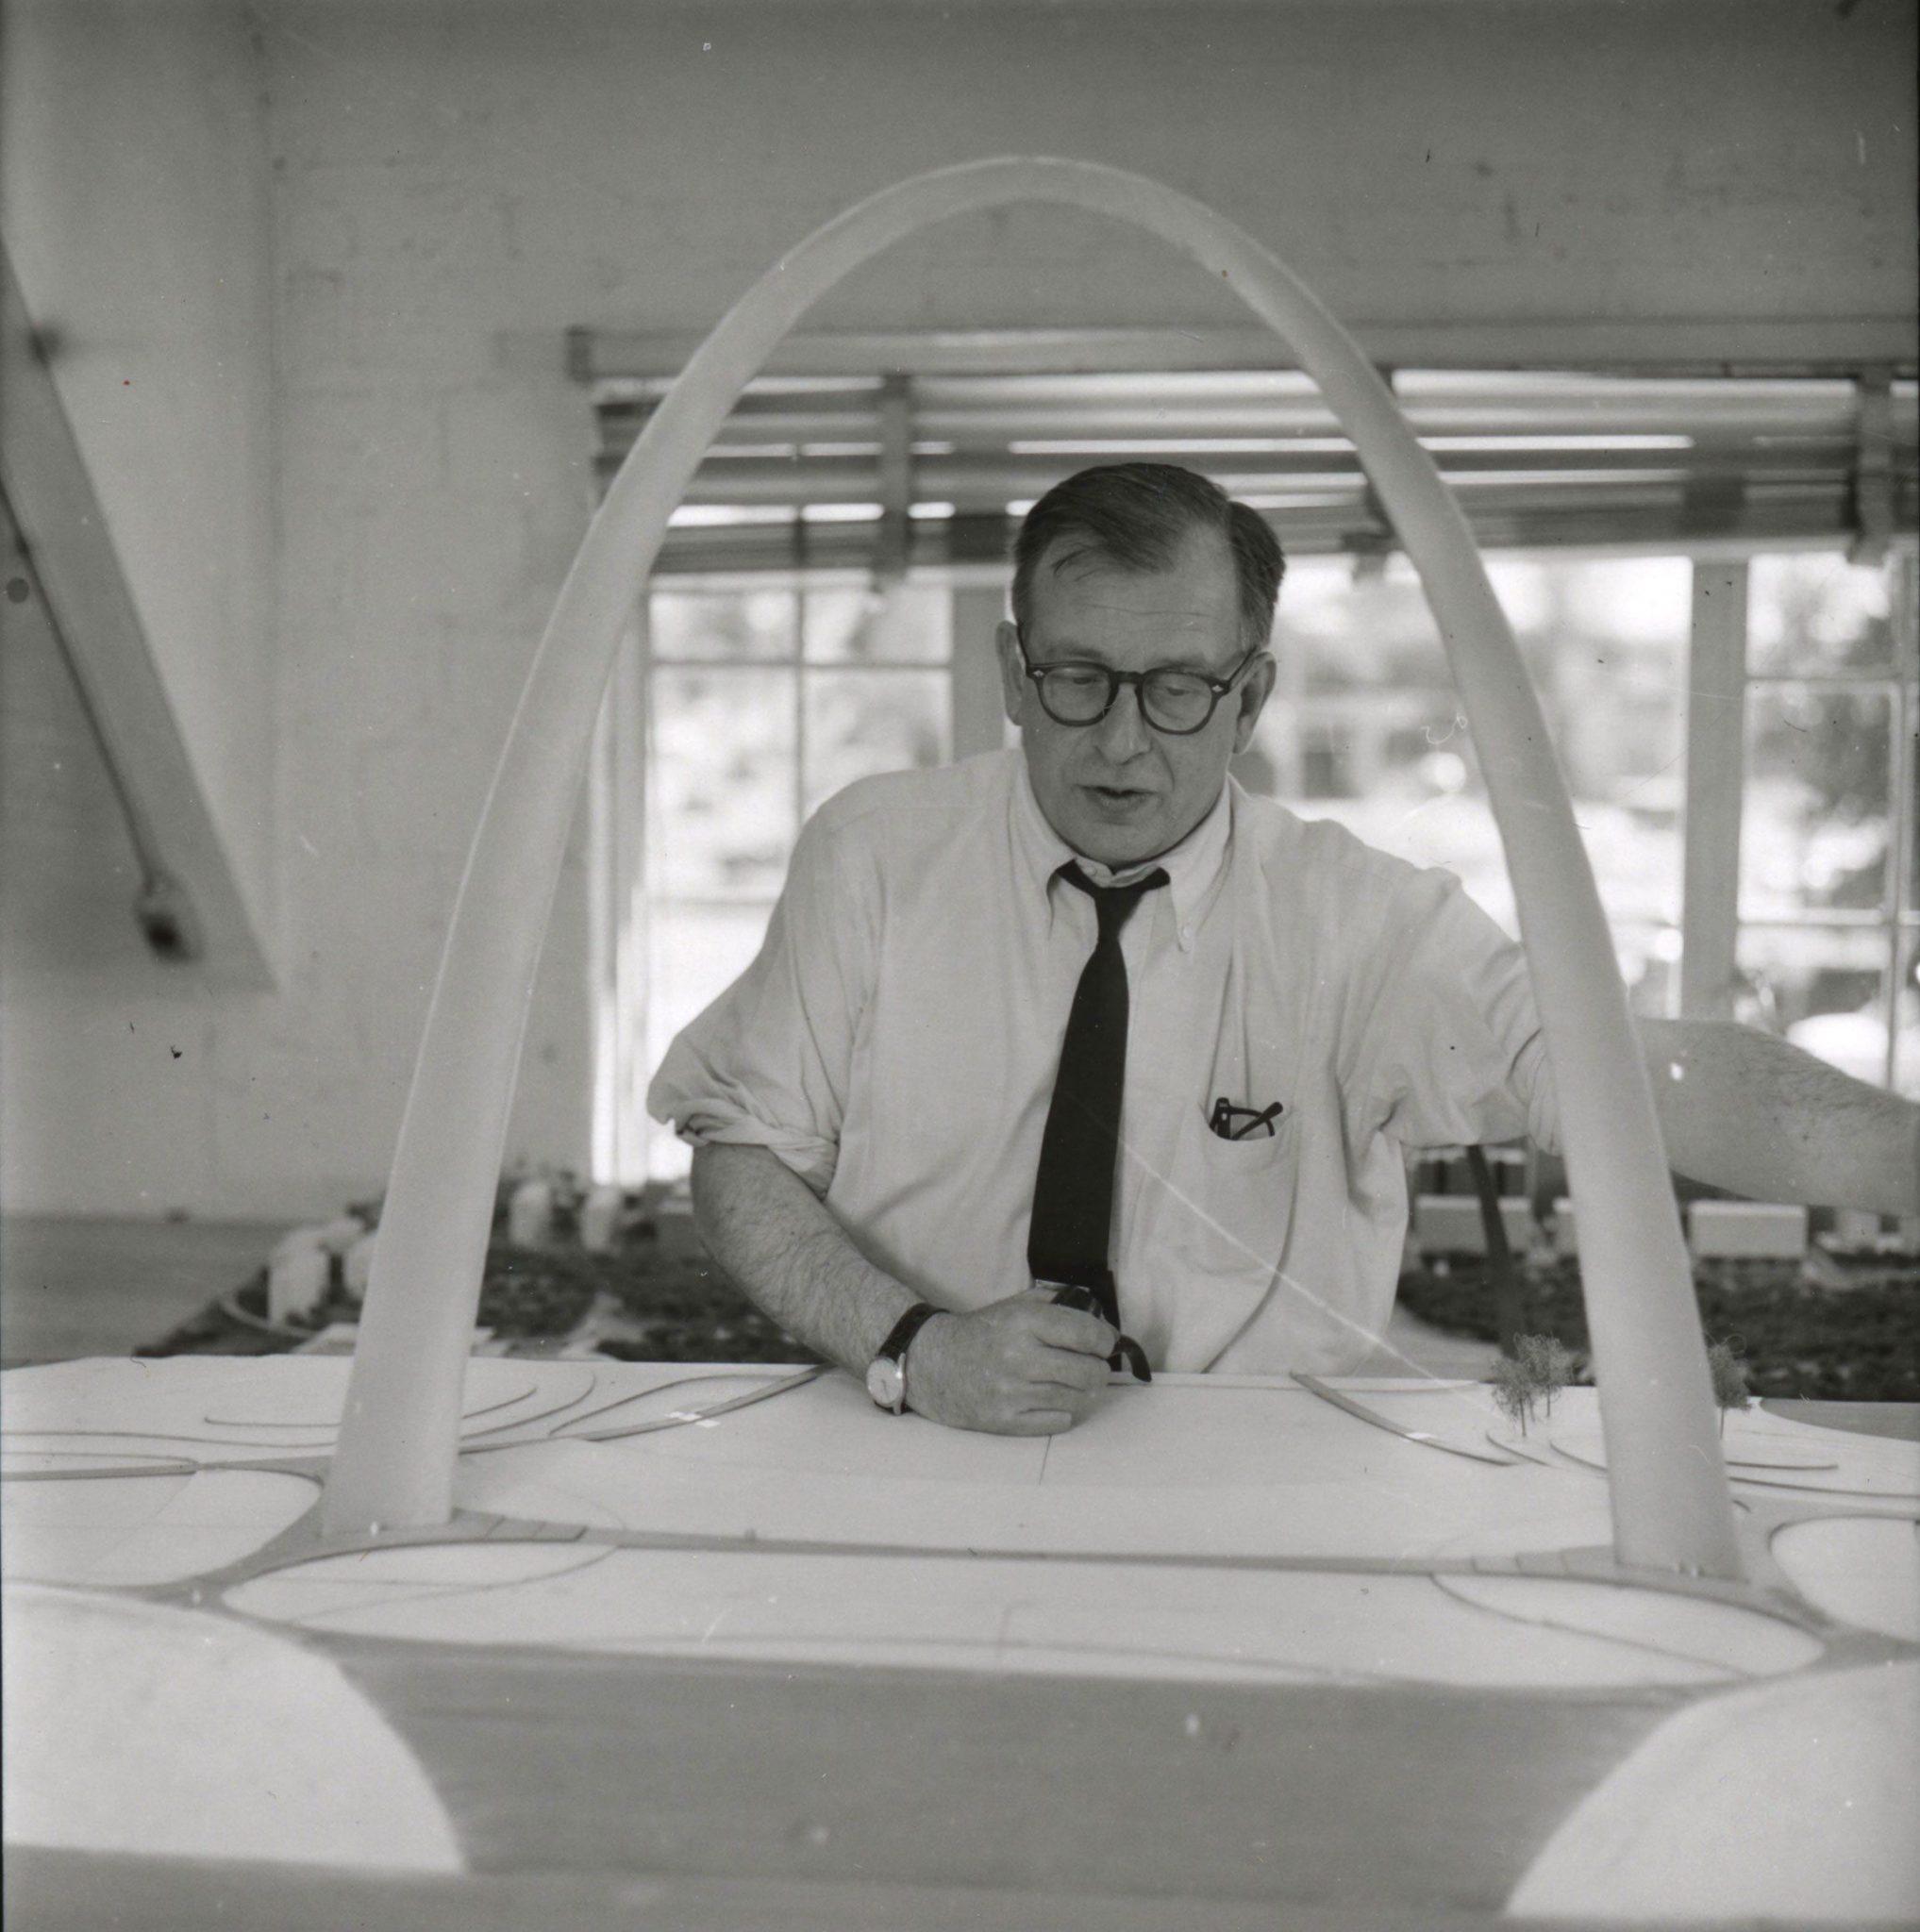 ارو سارینن معمار فنلاندی